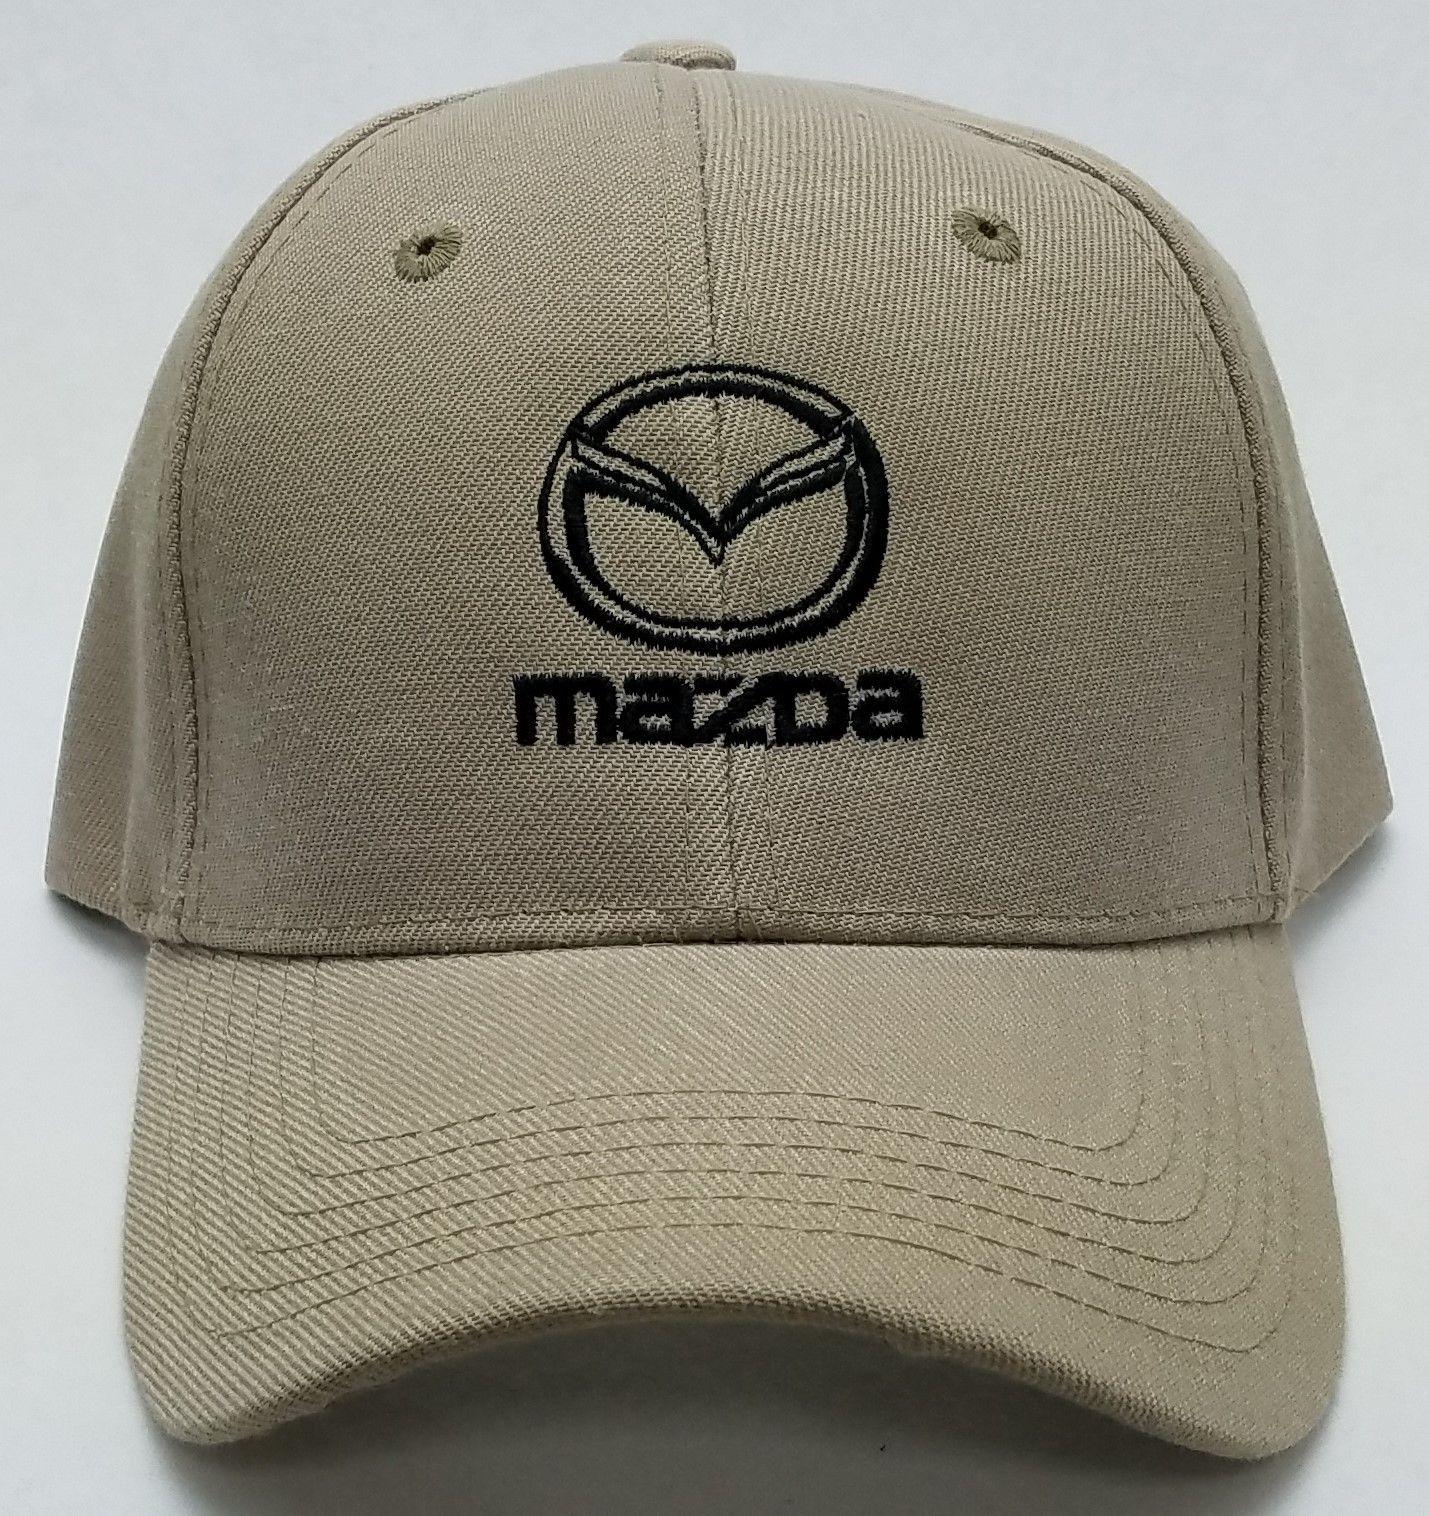 bfb65b4ff3839 Great Mazda Embroidered Baseball Hat Cap Adjustable Strap CX-3   MX ...